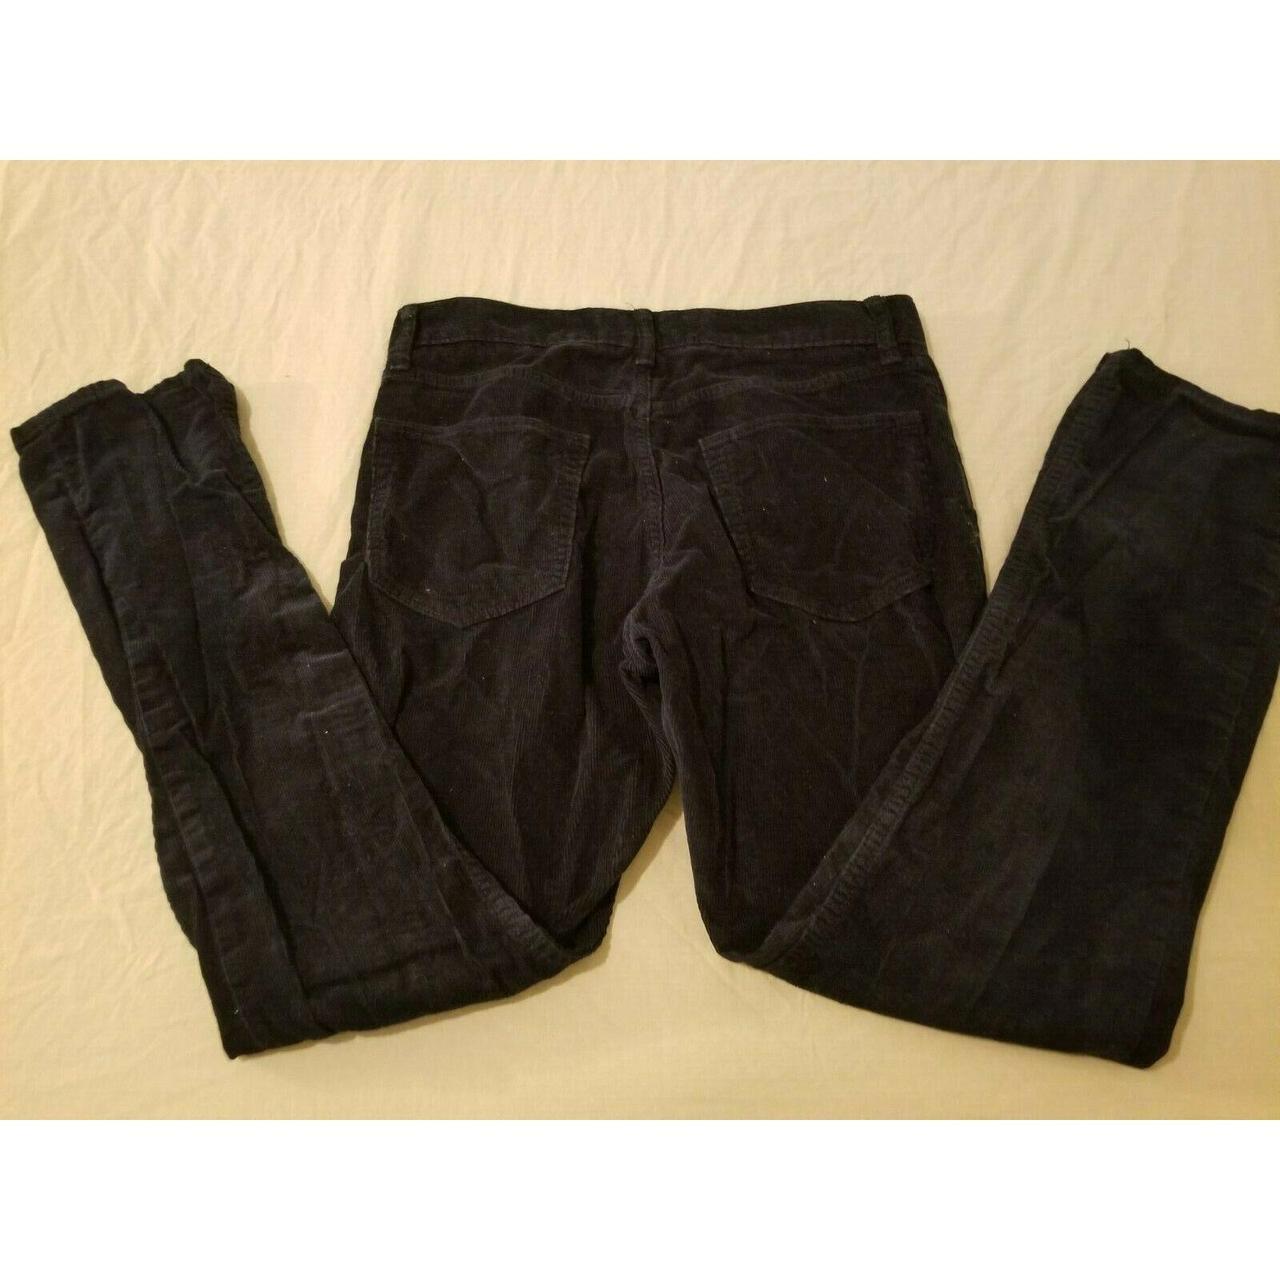 Product Image 1 - Banana Republic Corduroy Jeans Pants